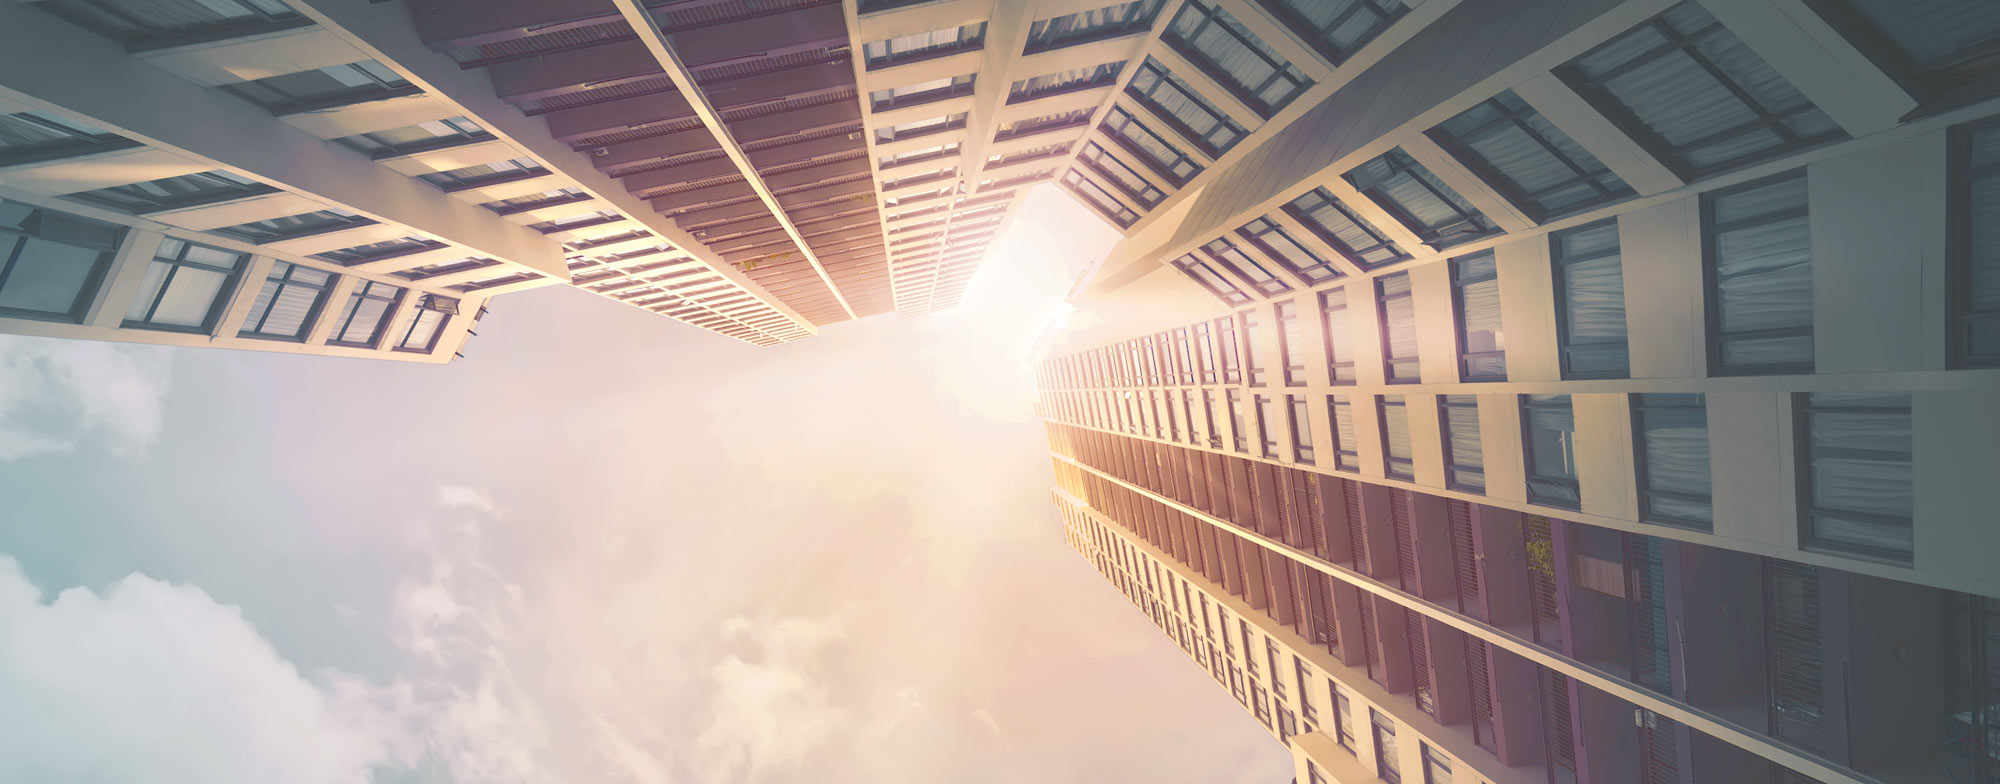 Exklusive Immobilieninvestition Entwicklung - Immobilieninvestition